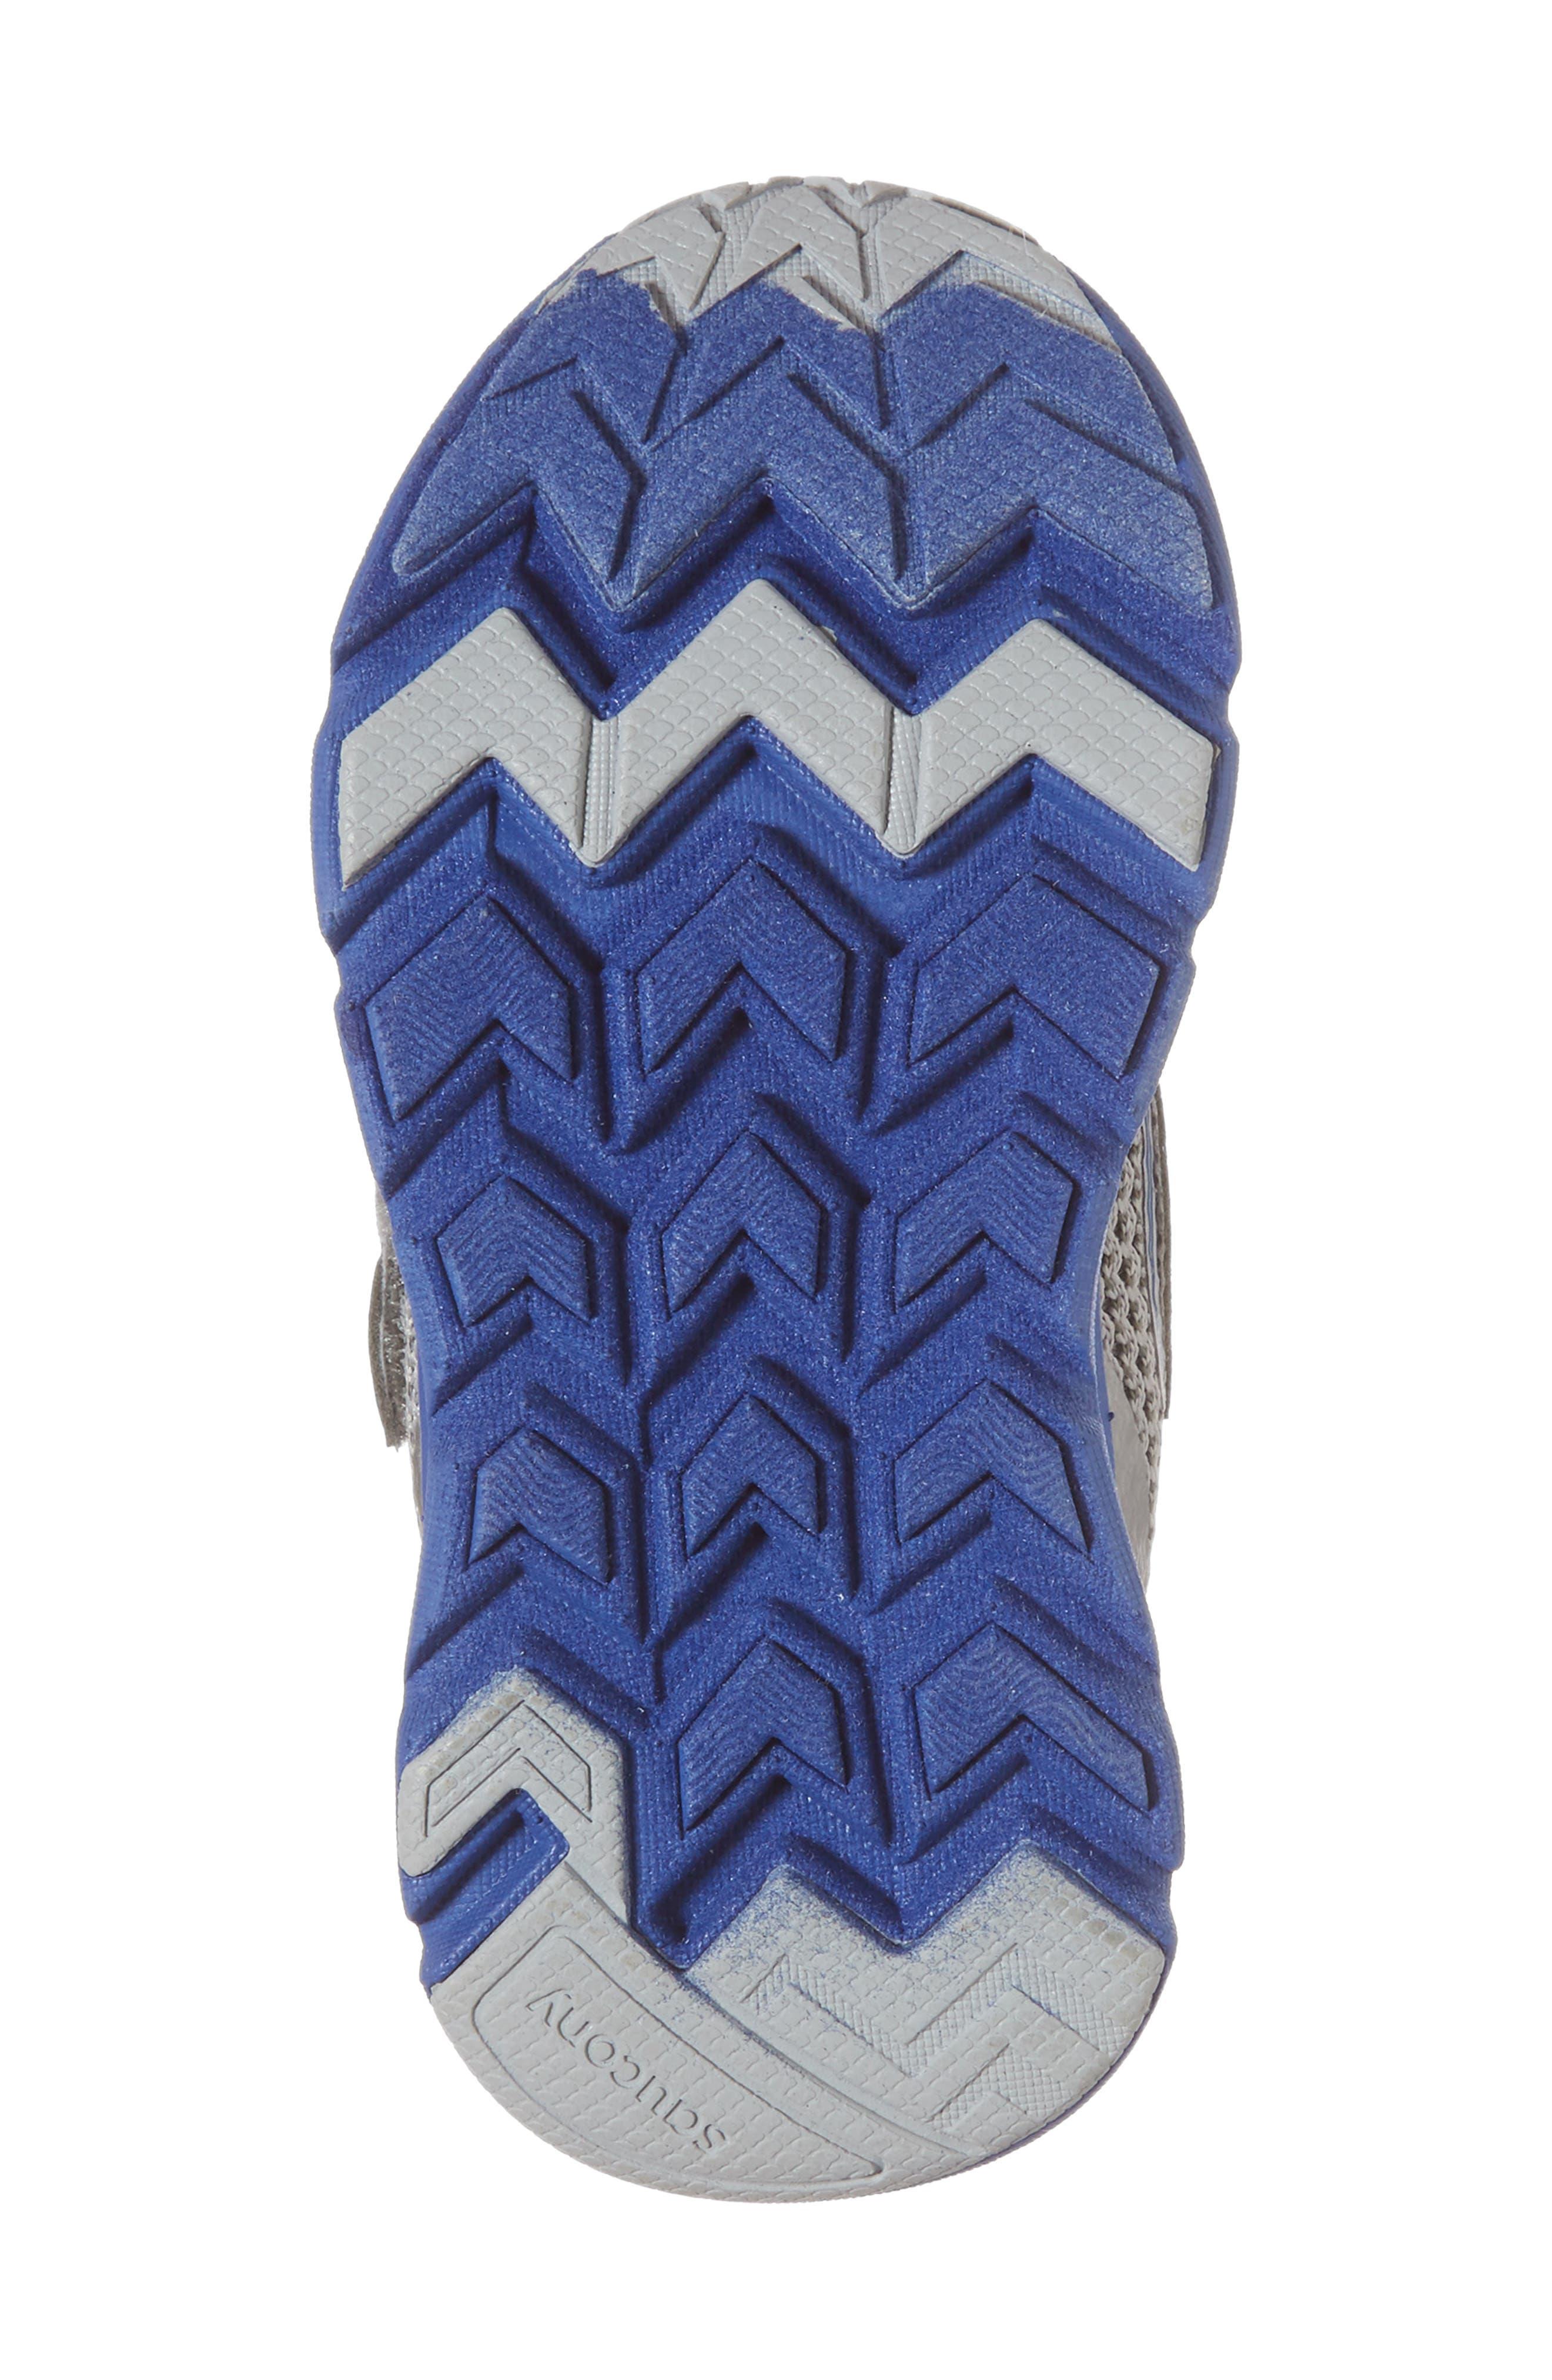 Baby Liteform Sneaker,                             Alternate thumbnail 6, color,                             Grey/ Blue